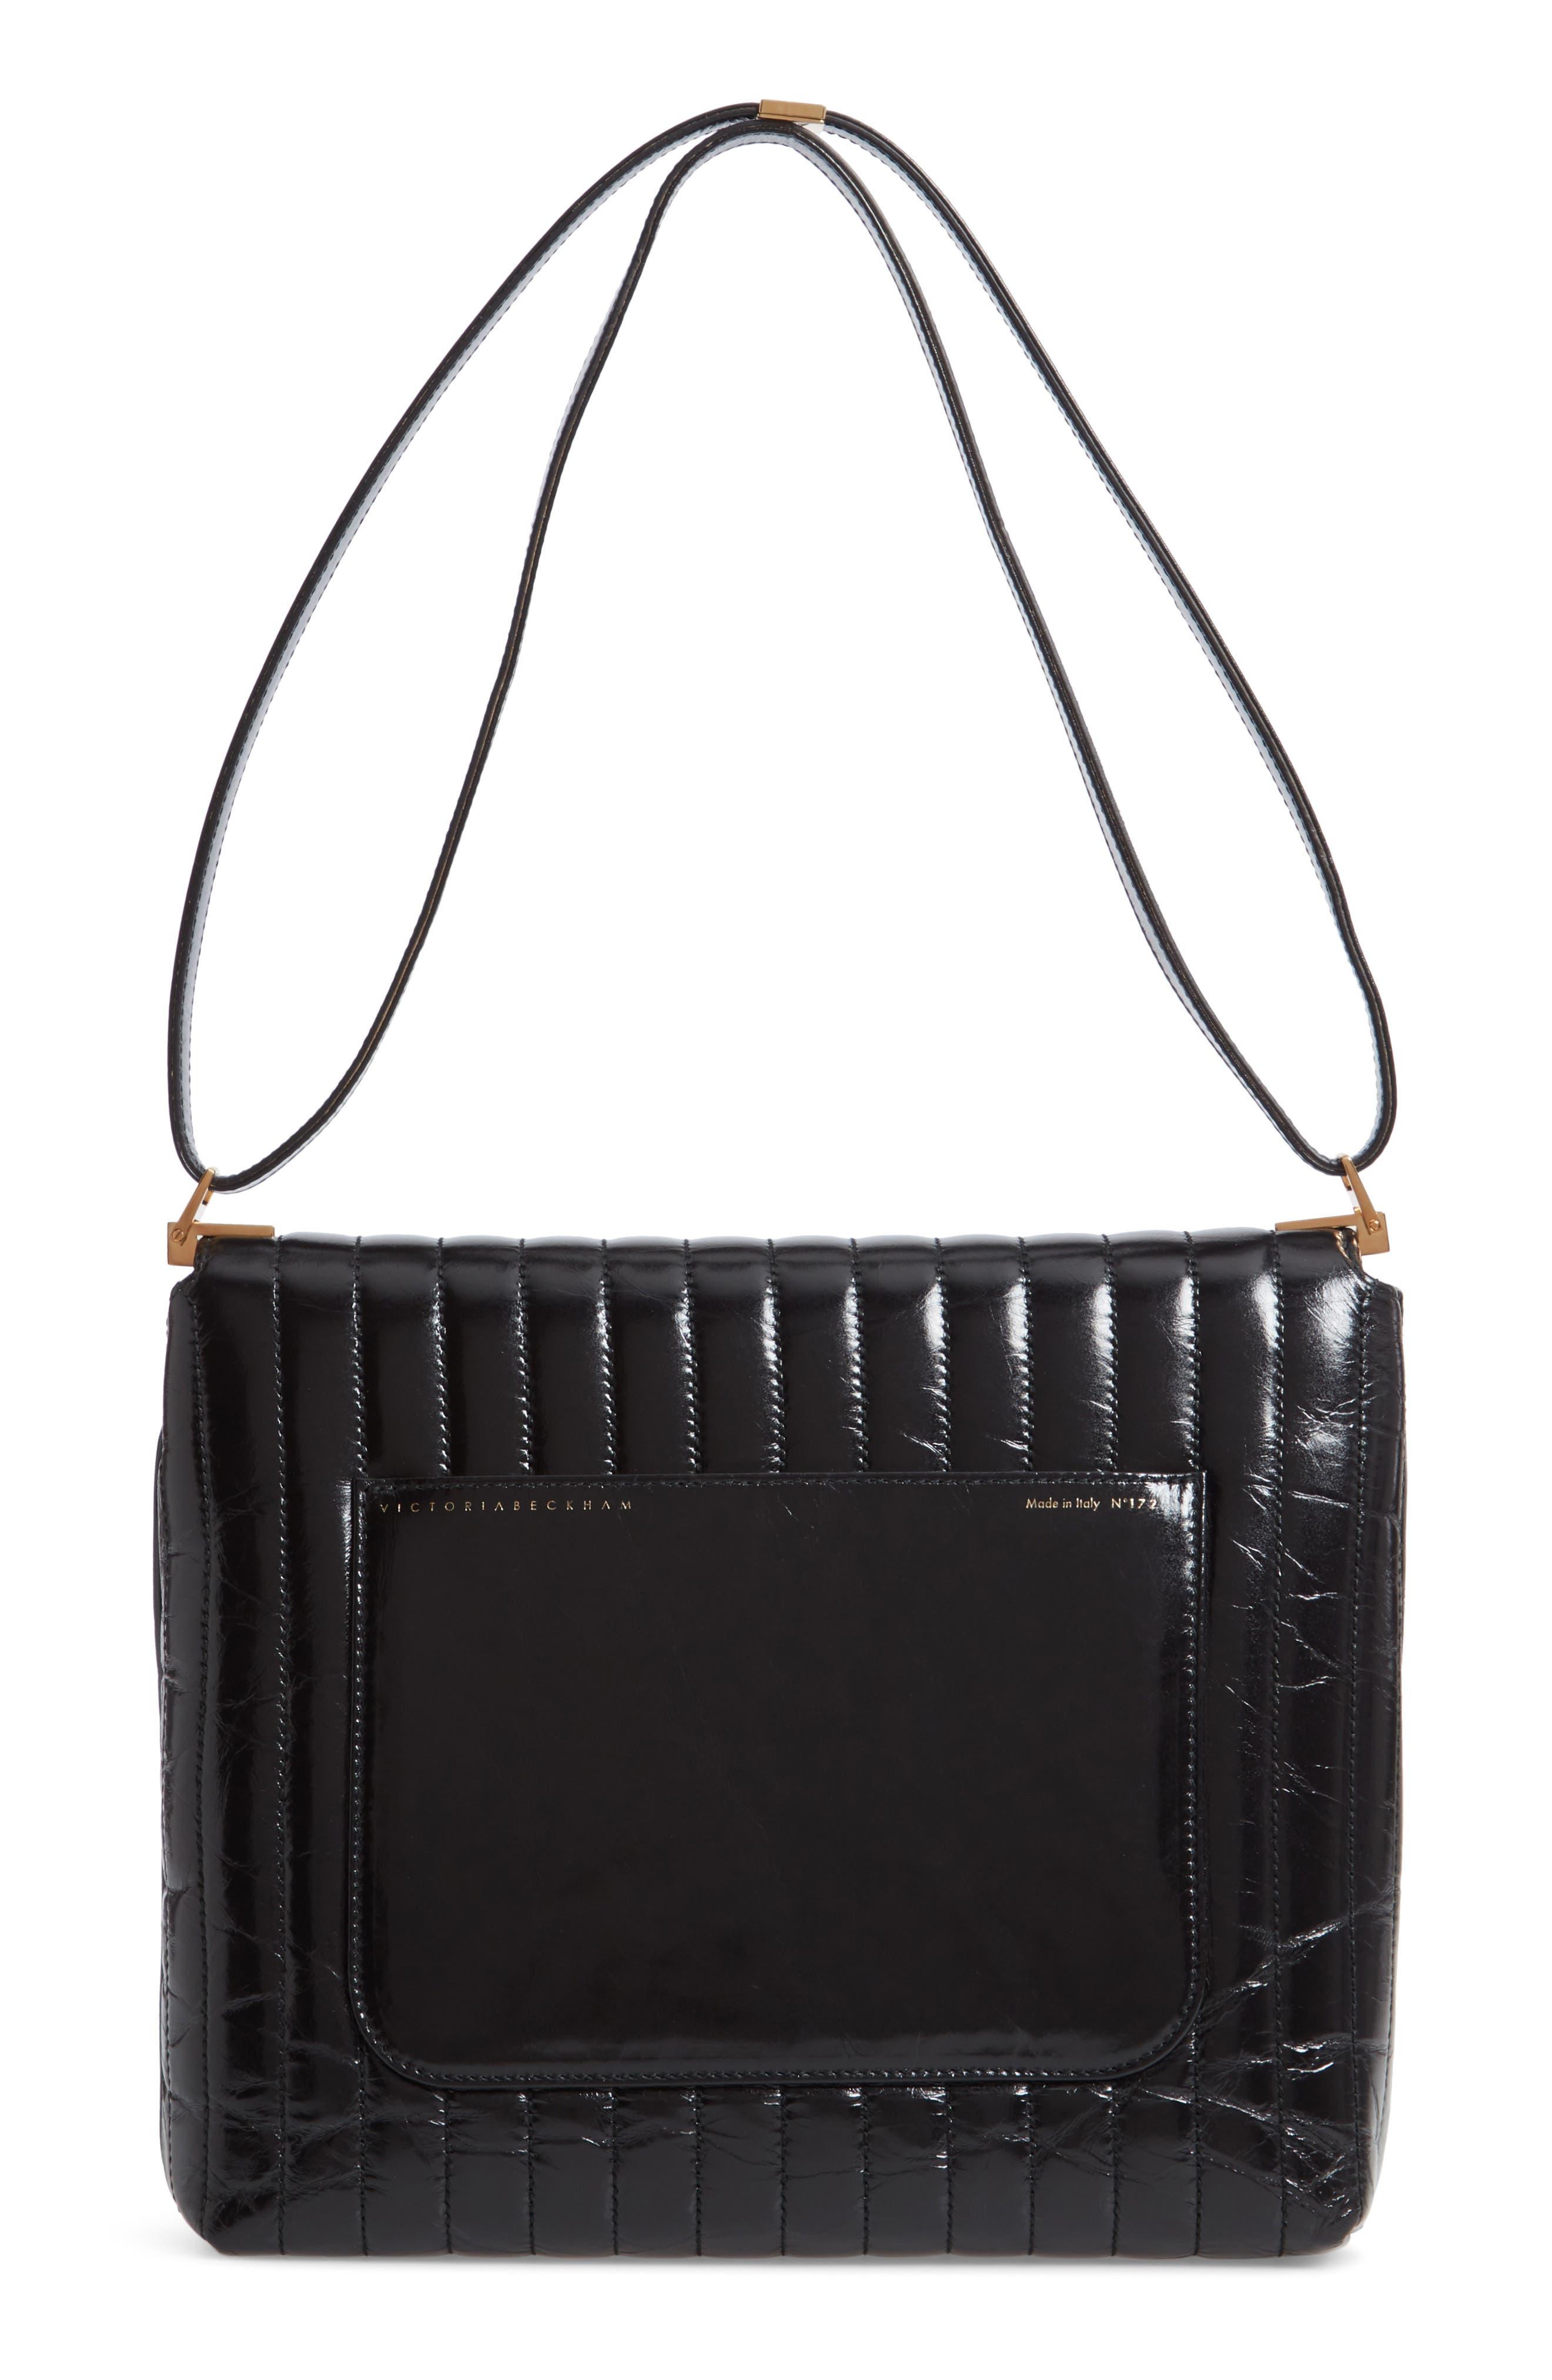 VICTORIA BECKHAM, Quinton Quilted Leather Shoulder Bag, Alternate thumbnail 3, color, 001